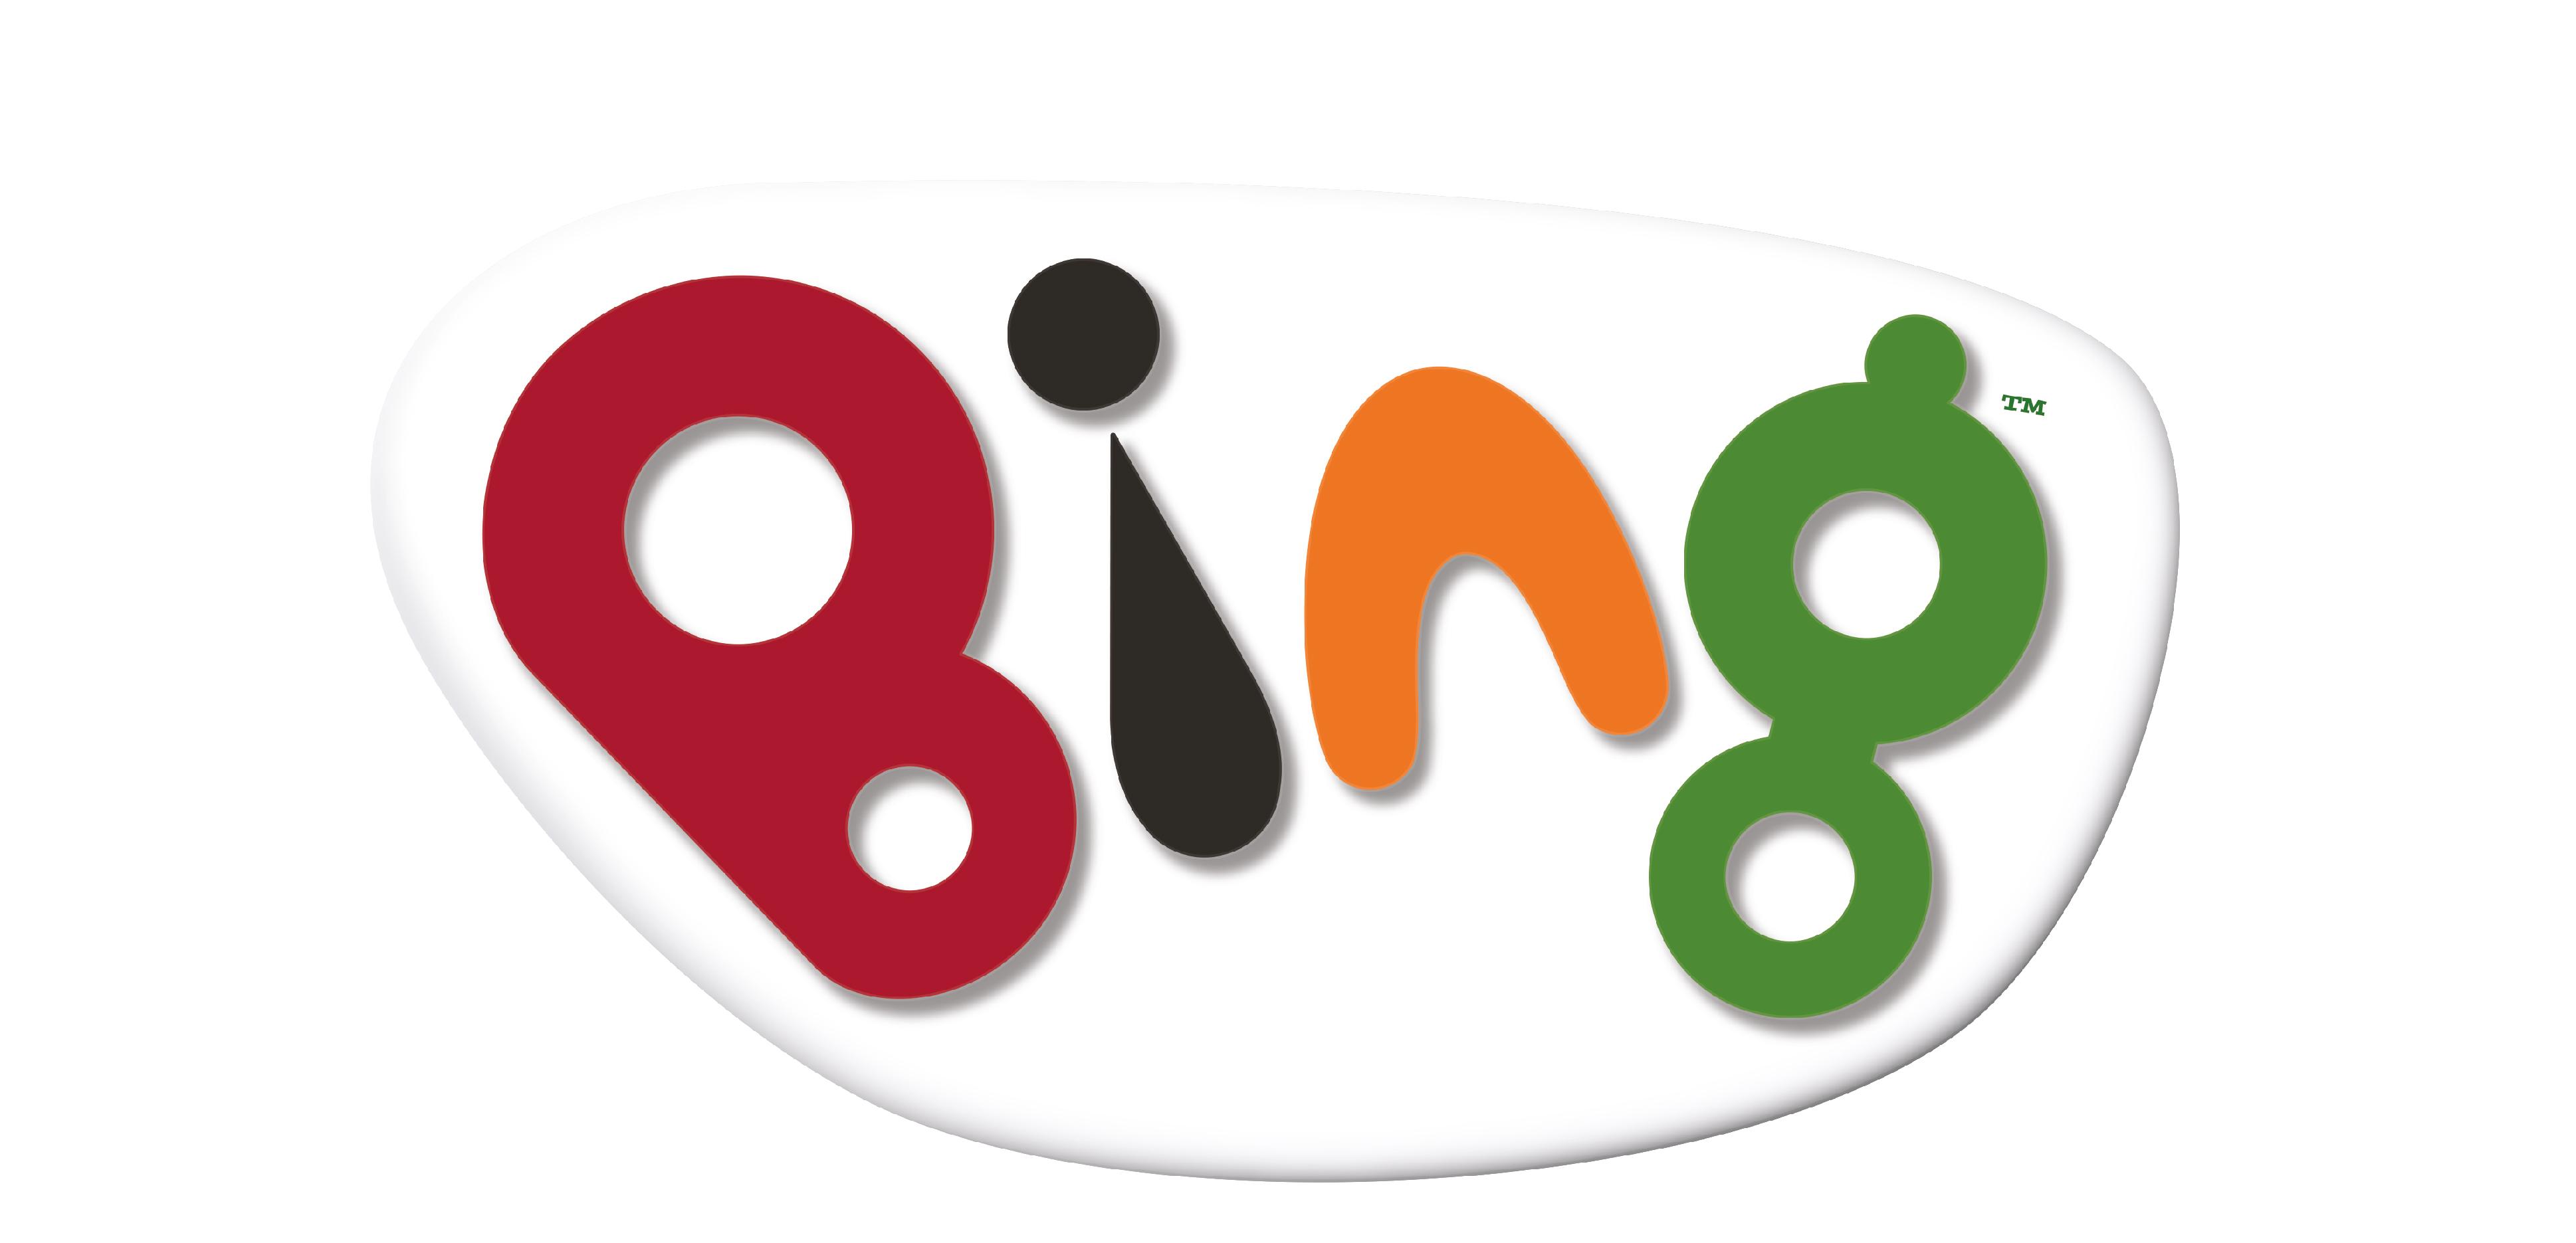 Aykroyds bunny datemay . Bing clipart symbol